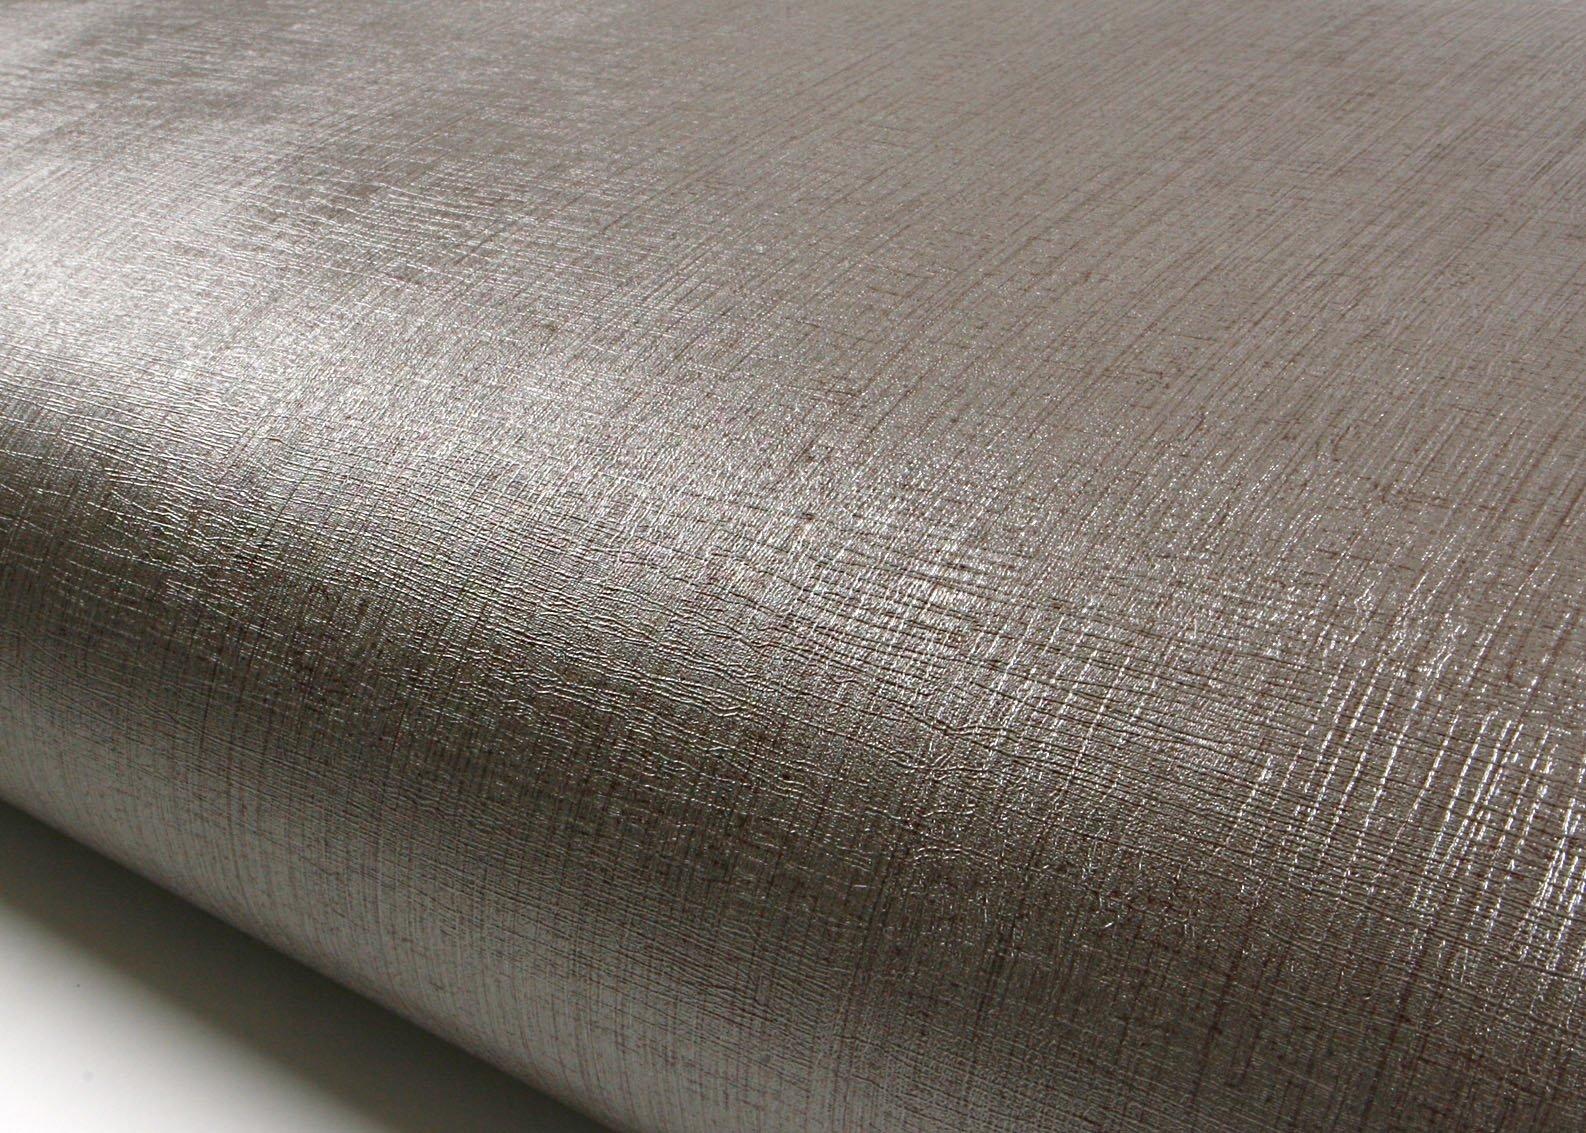 Peel & Stick Backsplash Fiber Ash Silver Purple Pearl Contact Paper Self-Adhesive Removable Wallpaper MG5010-1 : 2.00 Feet X 6.56 Feet